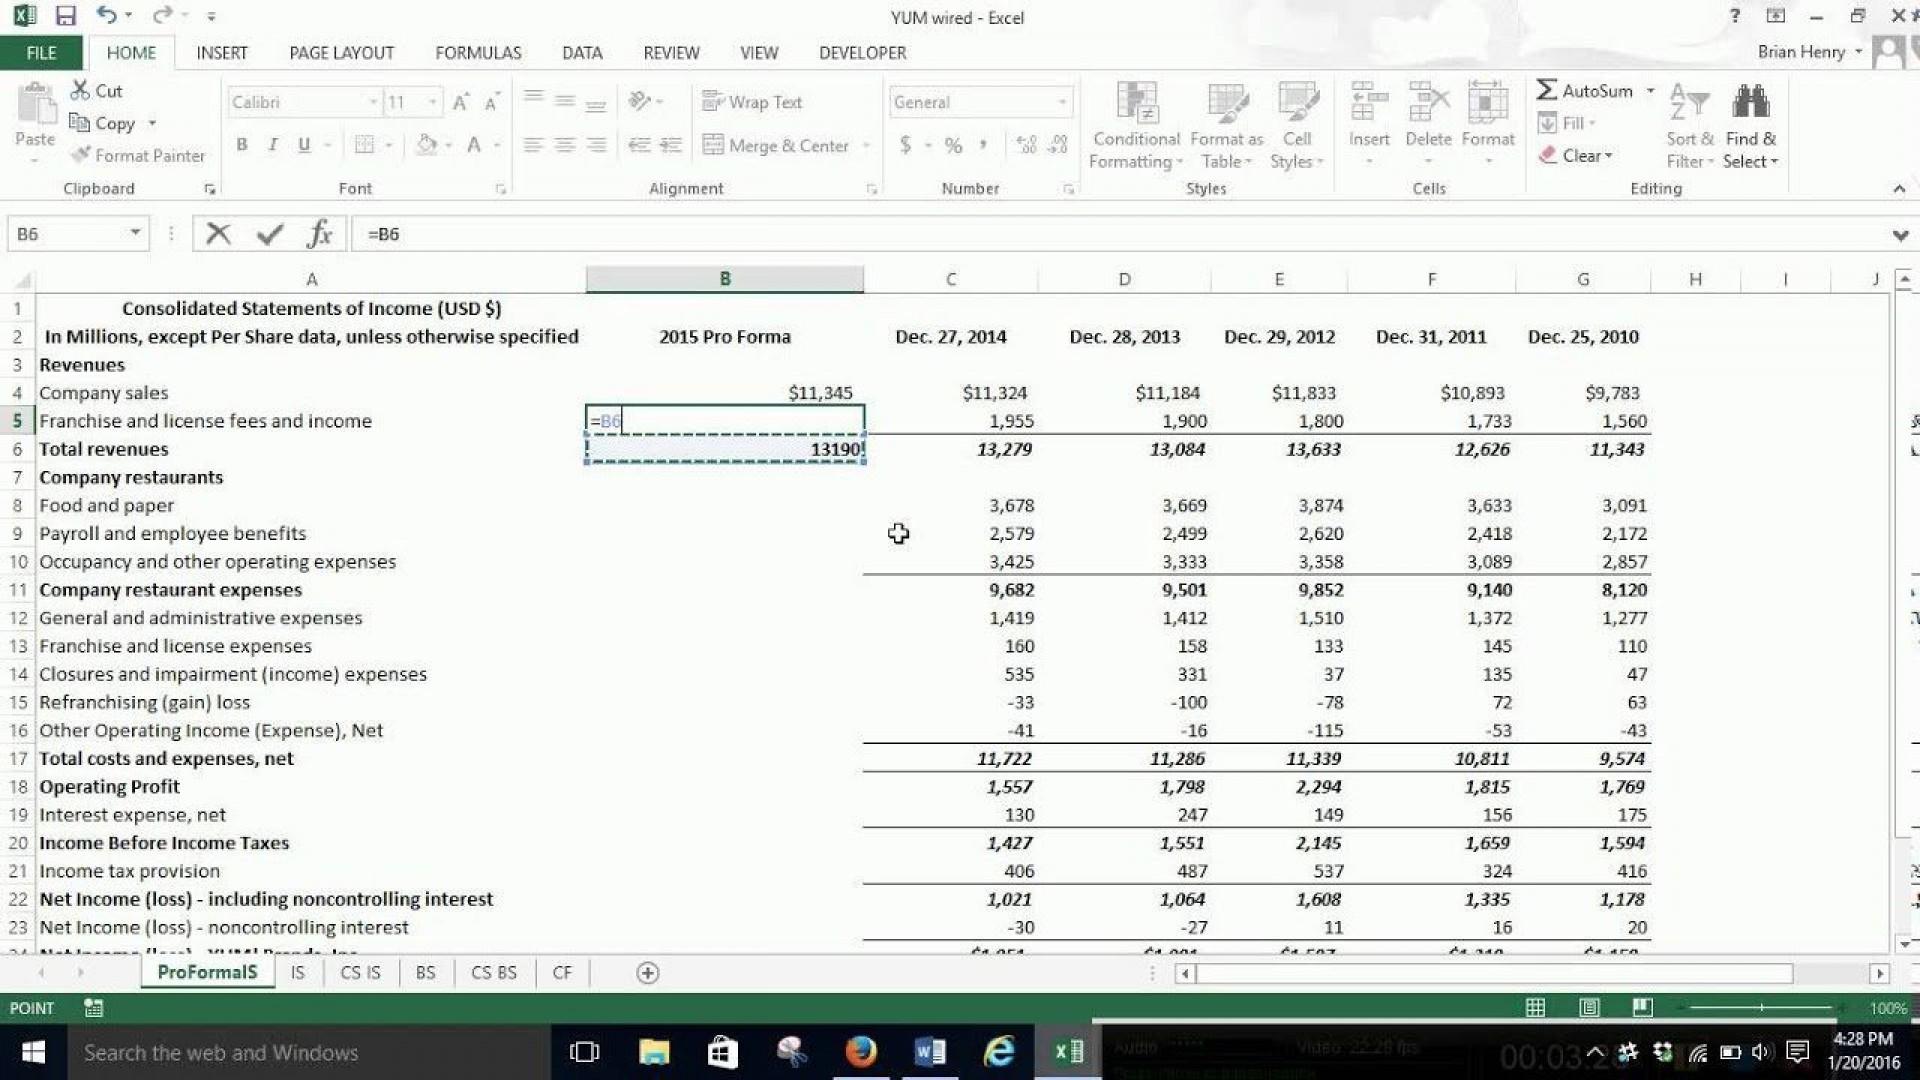 005 Impressive Pro Forma Financial Statement Template Image  Format Sample1920